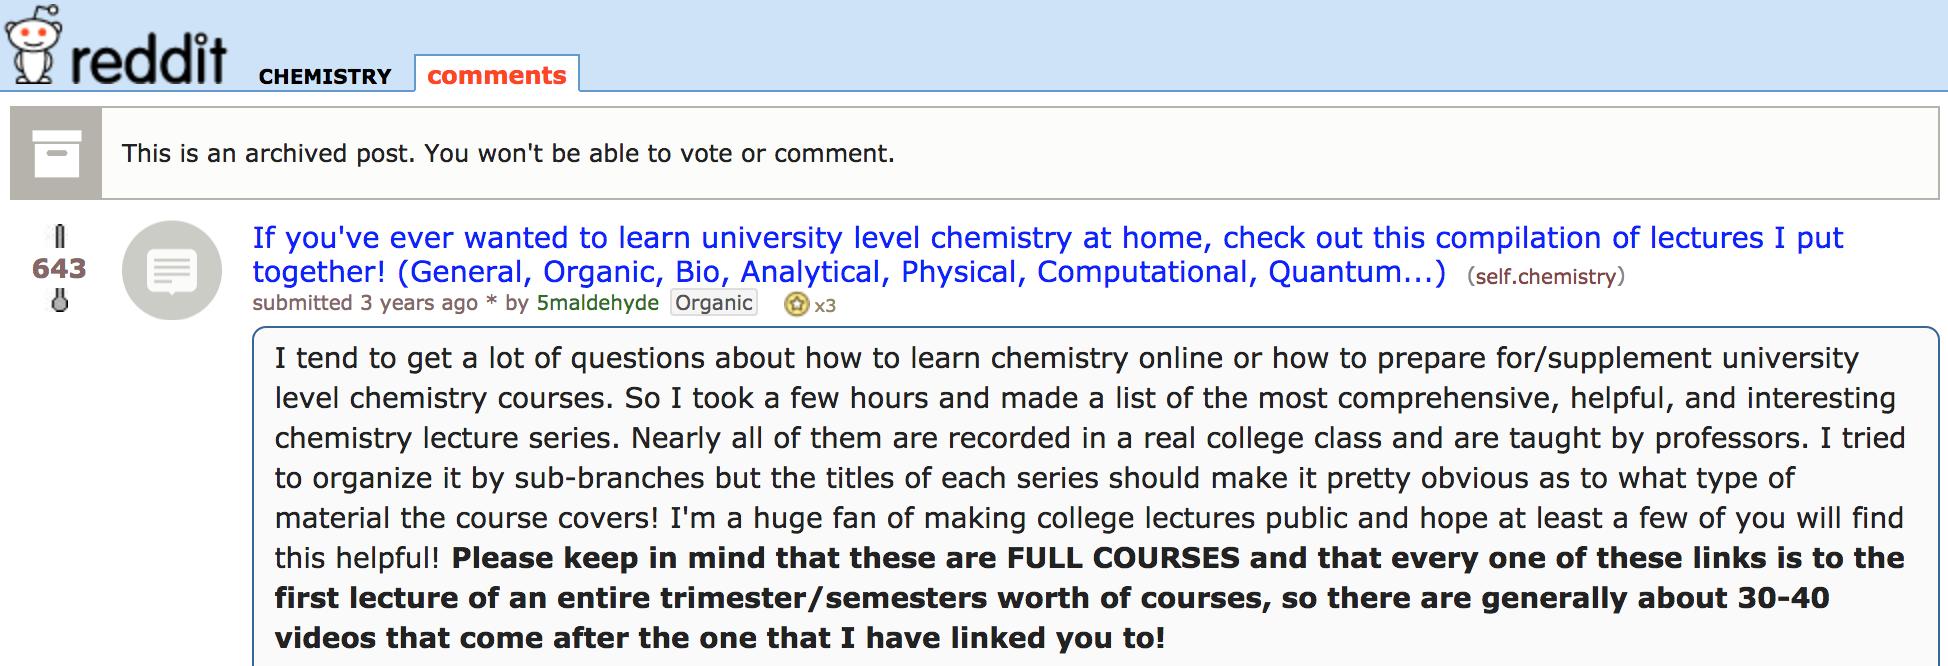 Screenshot showing a reddit post